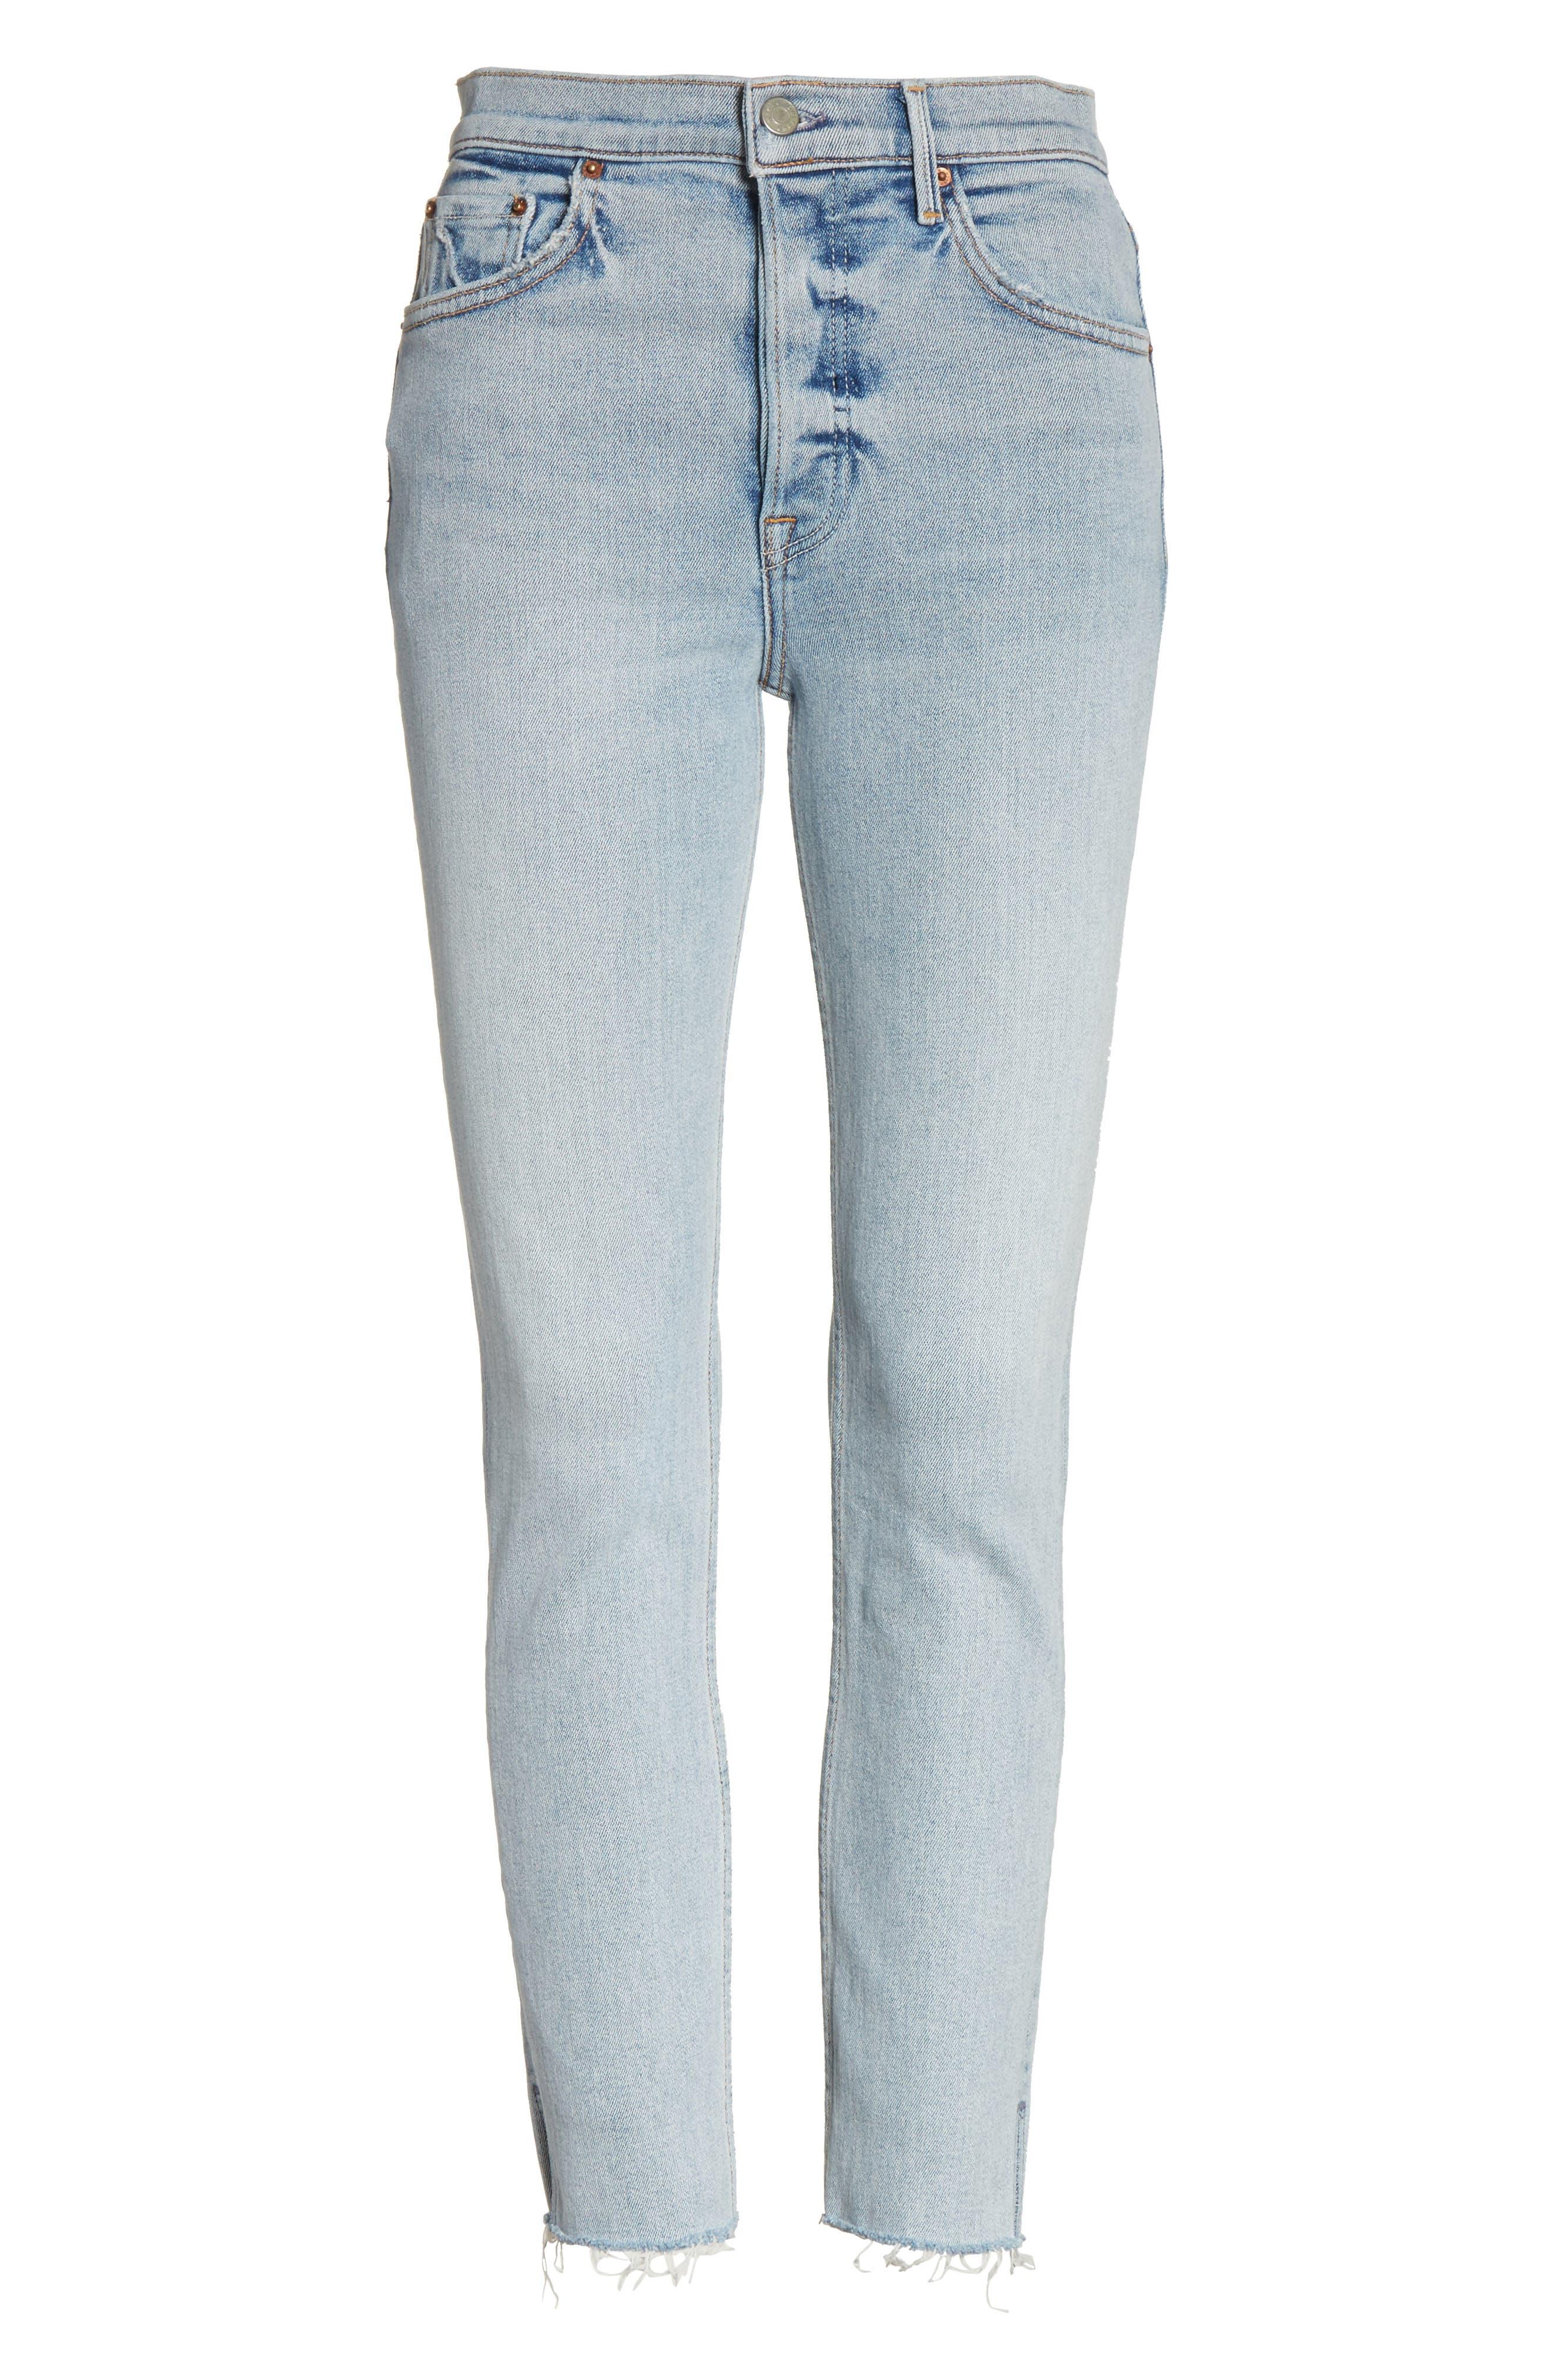 Karolina High Waist Skinny Jeans,                             Alternate thumbnail 7, color,                             TITANIUM